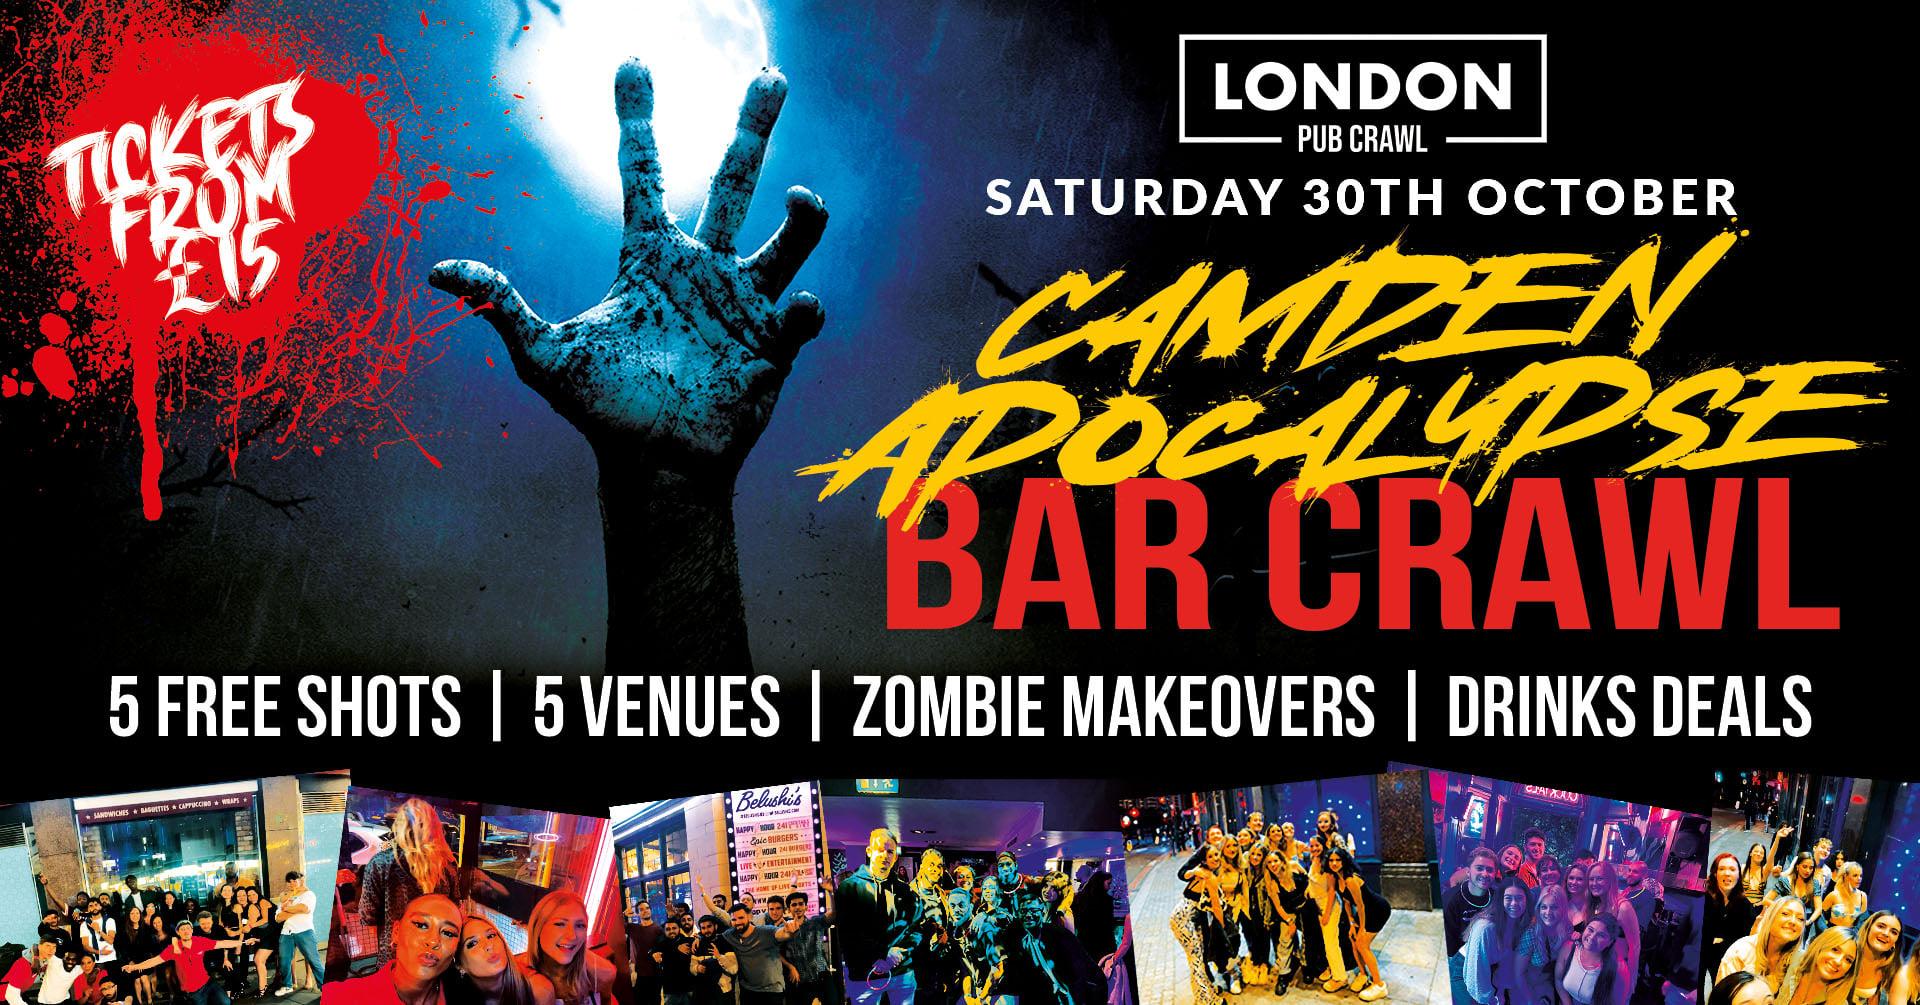 Camden Apocalypse // LDN's Biggest Halloween Bar Crawl // Free Shots